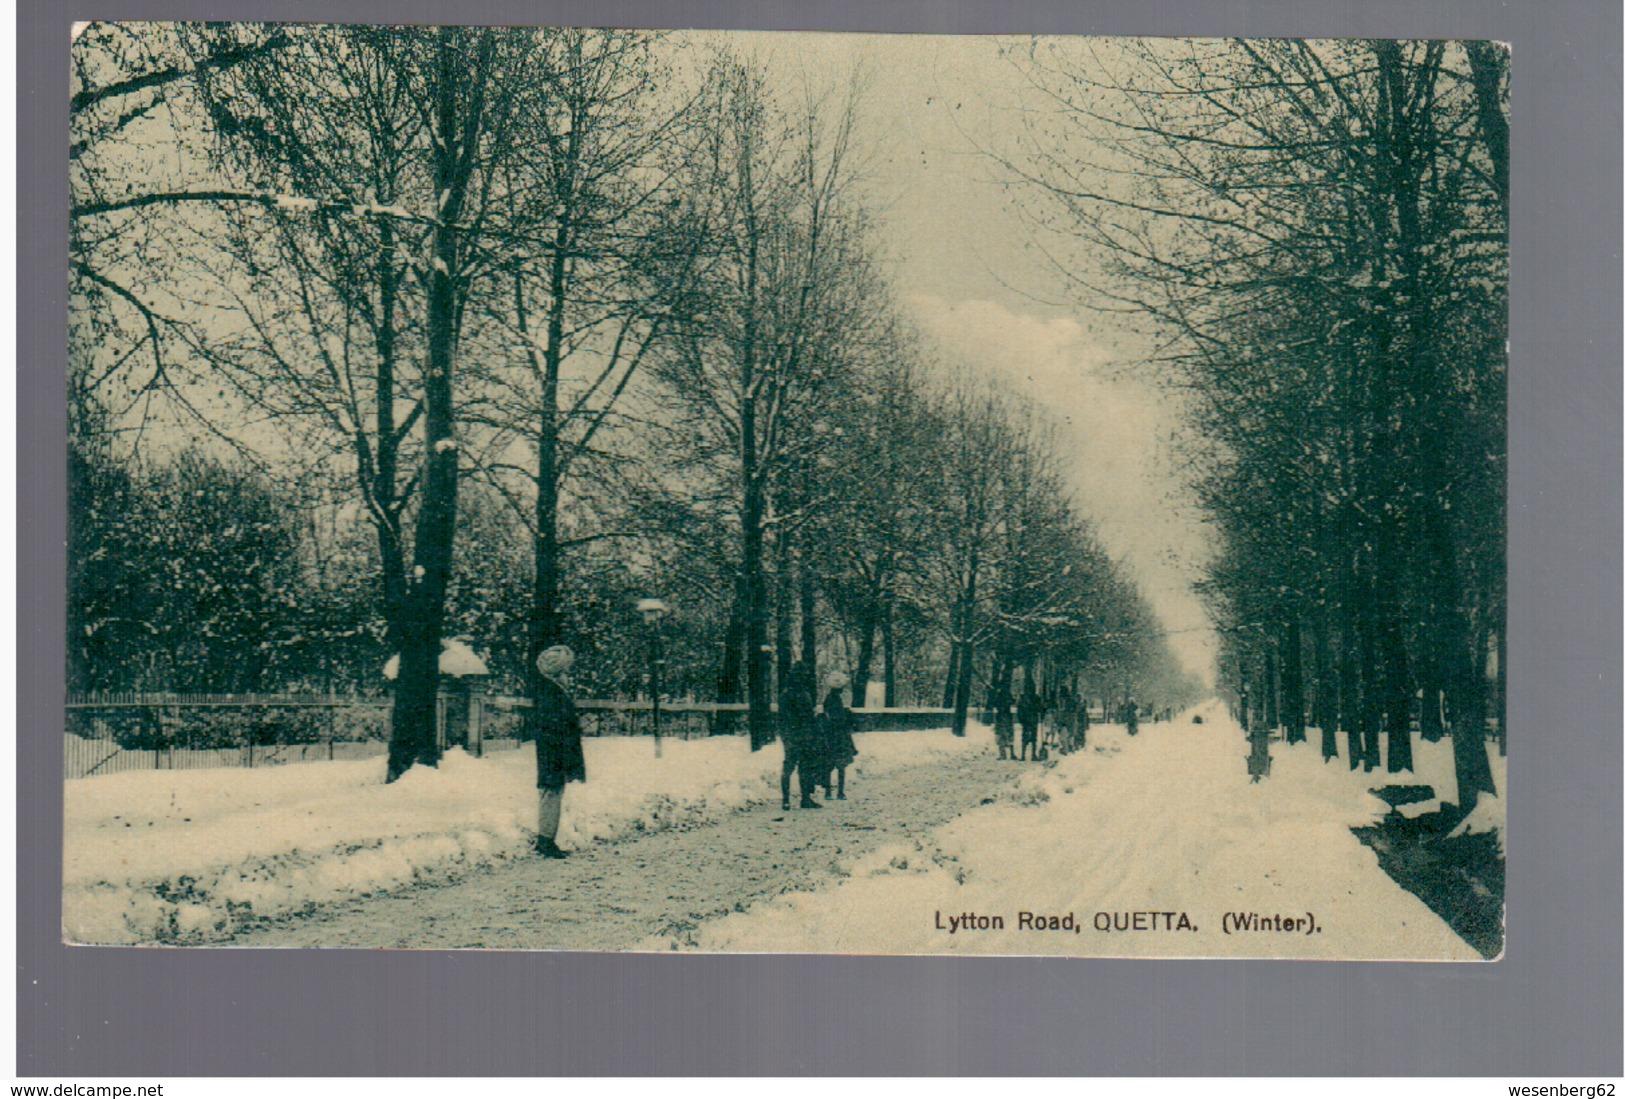 PAKISTAN Quetta, Lytton Road (Winter) Ca 1920 OLD POSTCARD - Pakistan